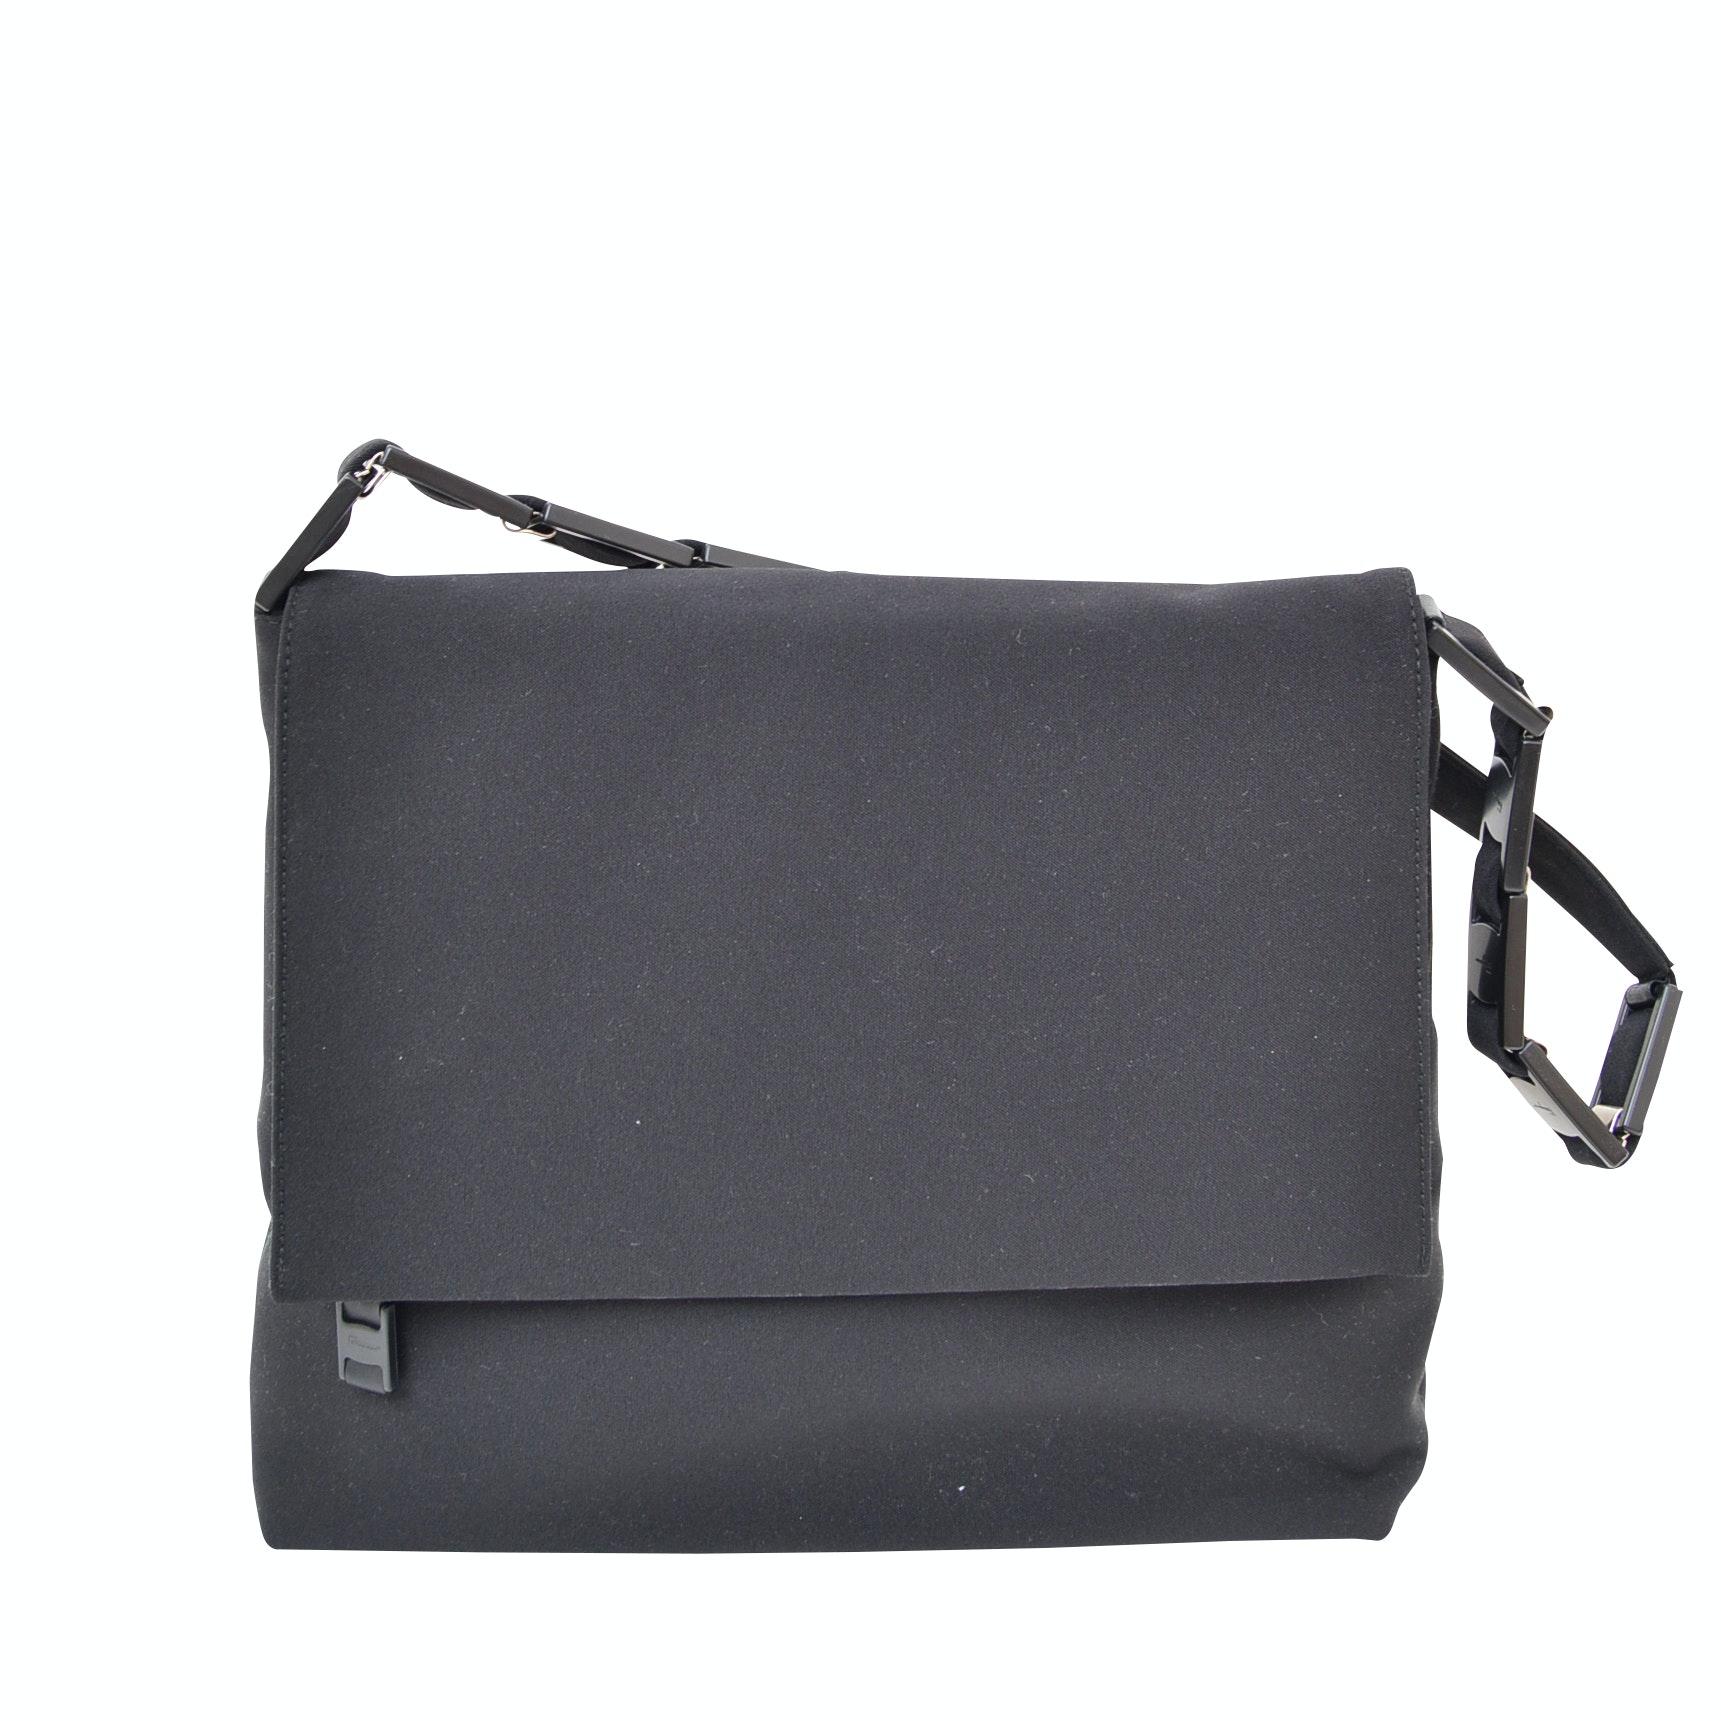 Salvatore Ferragamo Fabric Handbag